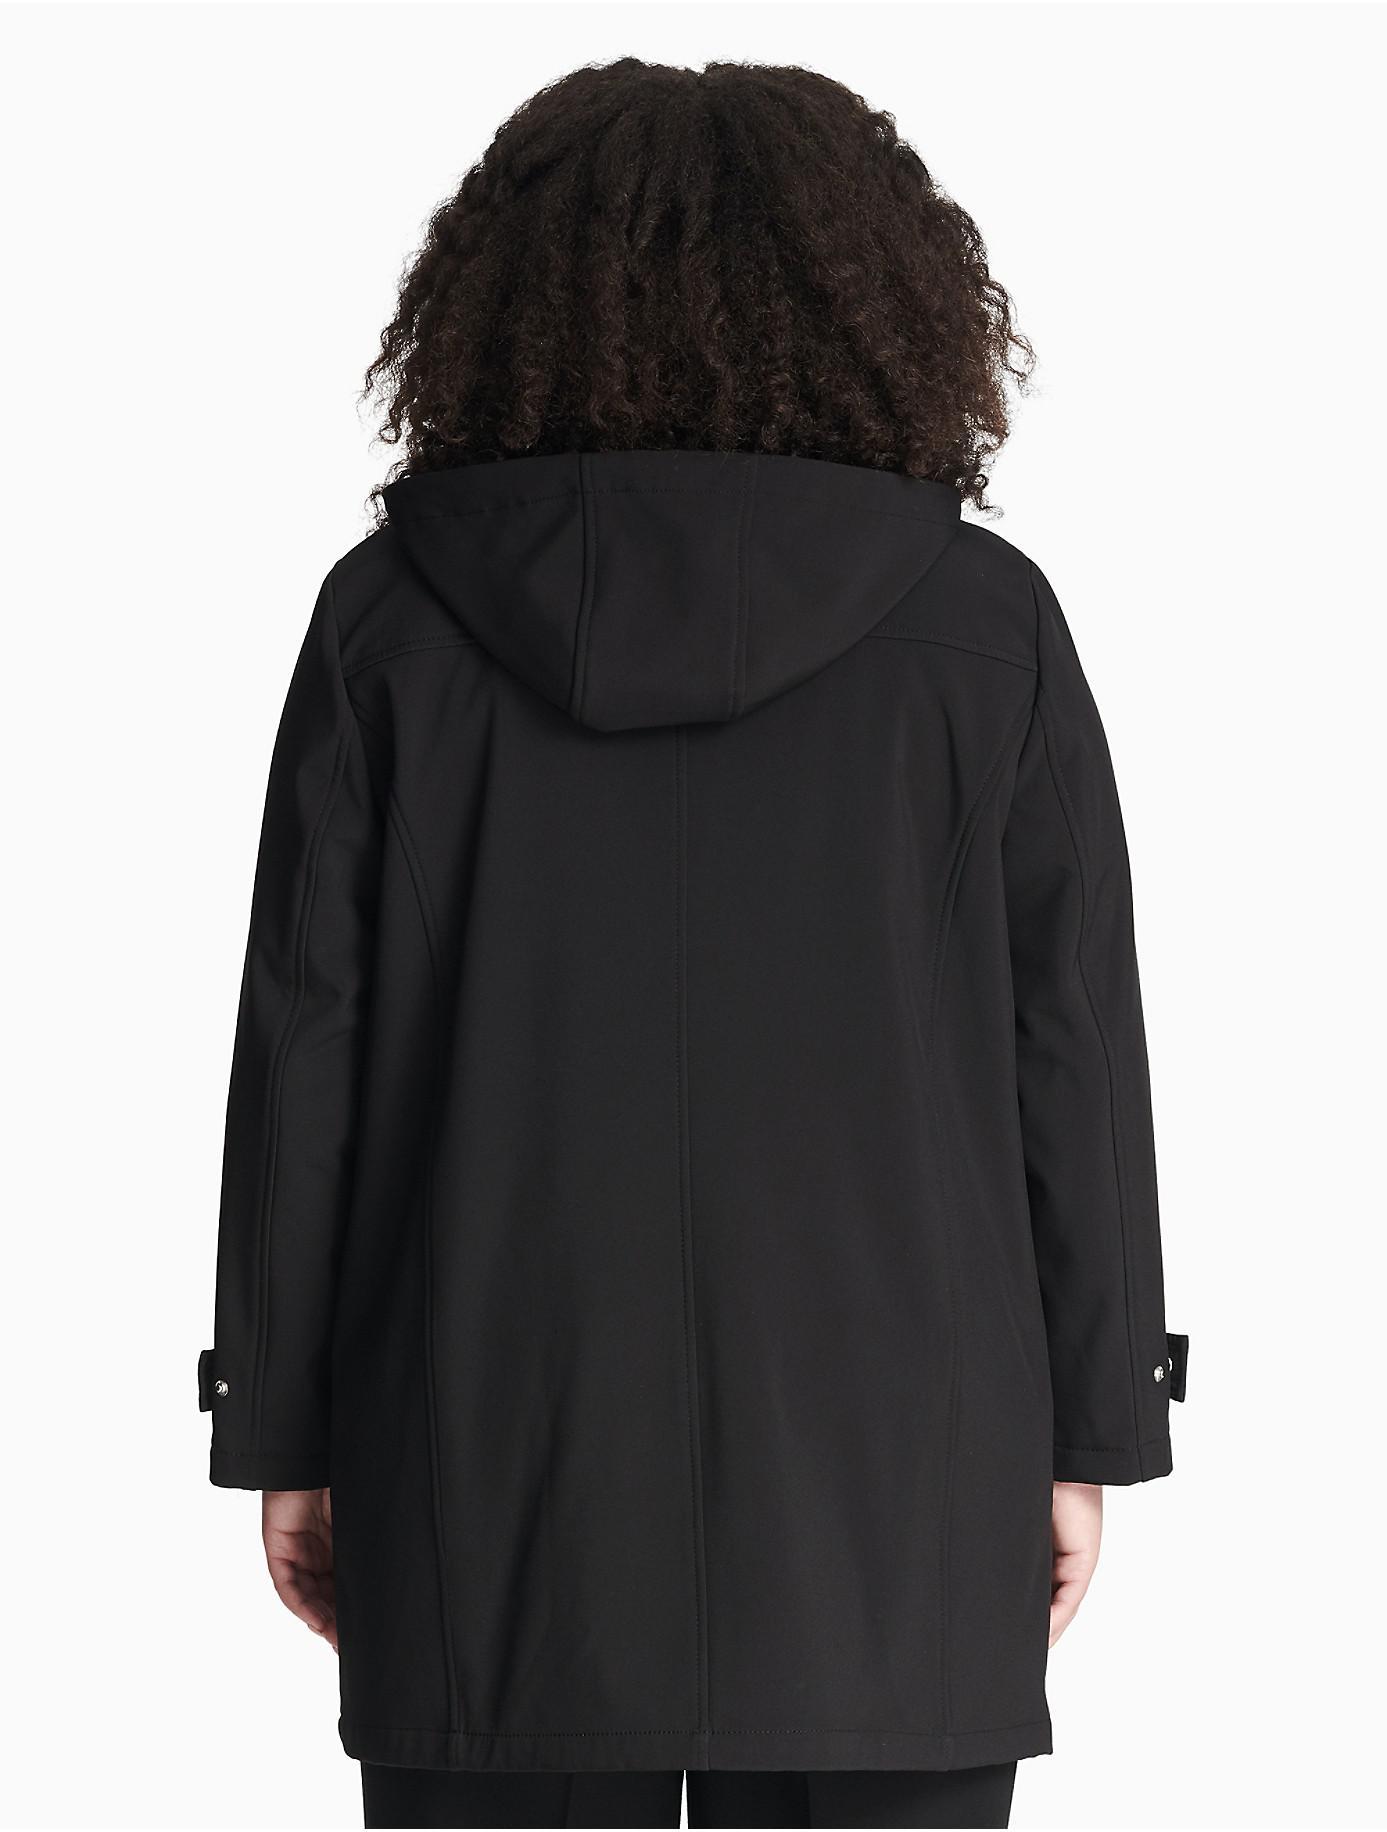 0bf20b2200c Calvin Klein - Black Plus Size Soft Shell Hooded Jacket - Lyst. View  fullscreen